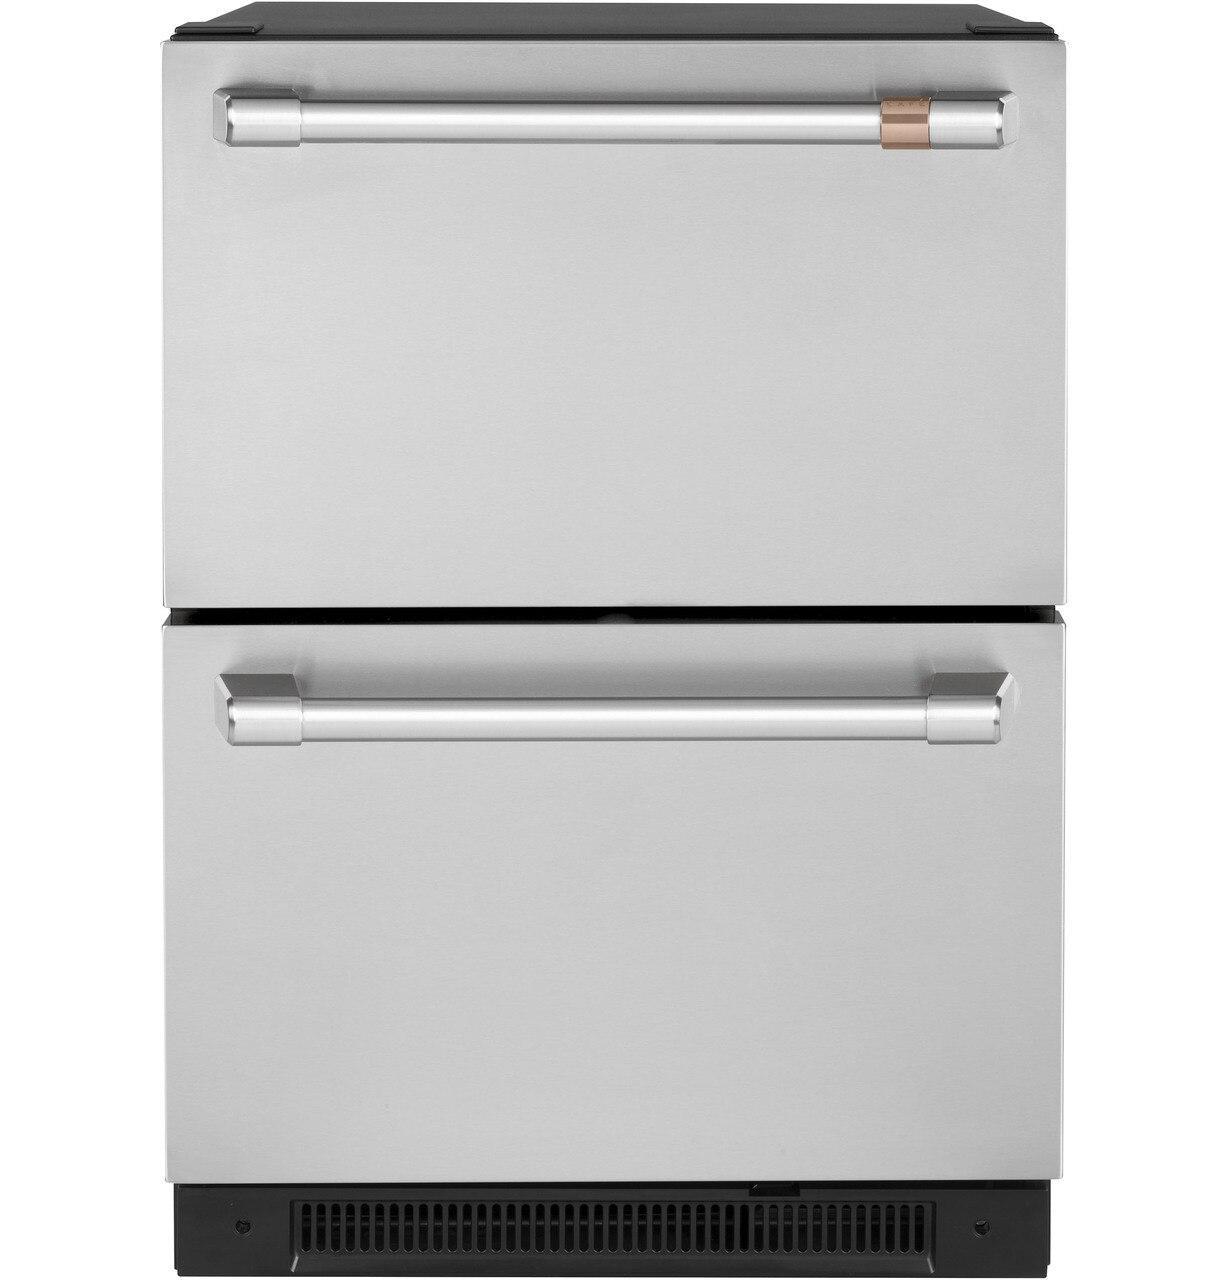 Cafe Appliances5.7 Cu. Ft. Built-In Dual-Drawer Refrigerator